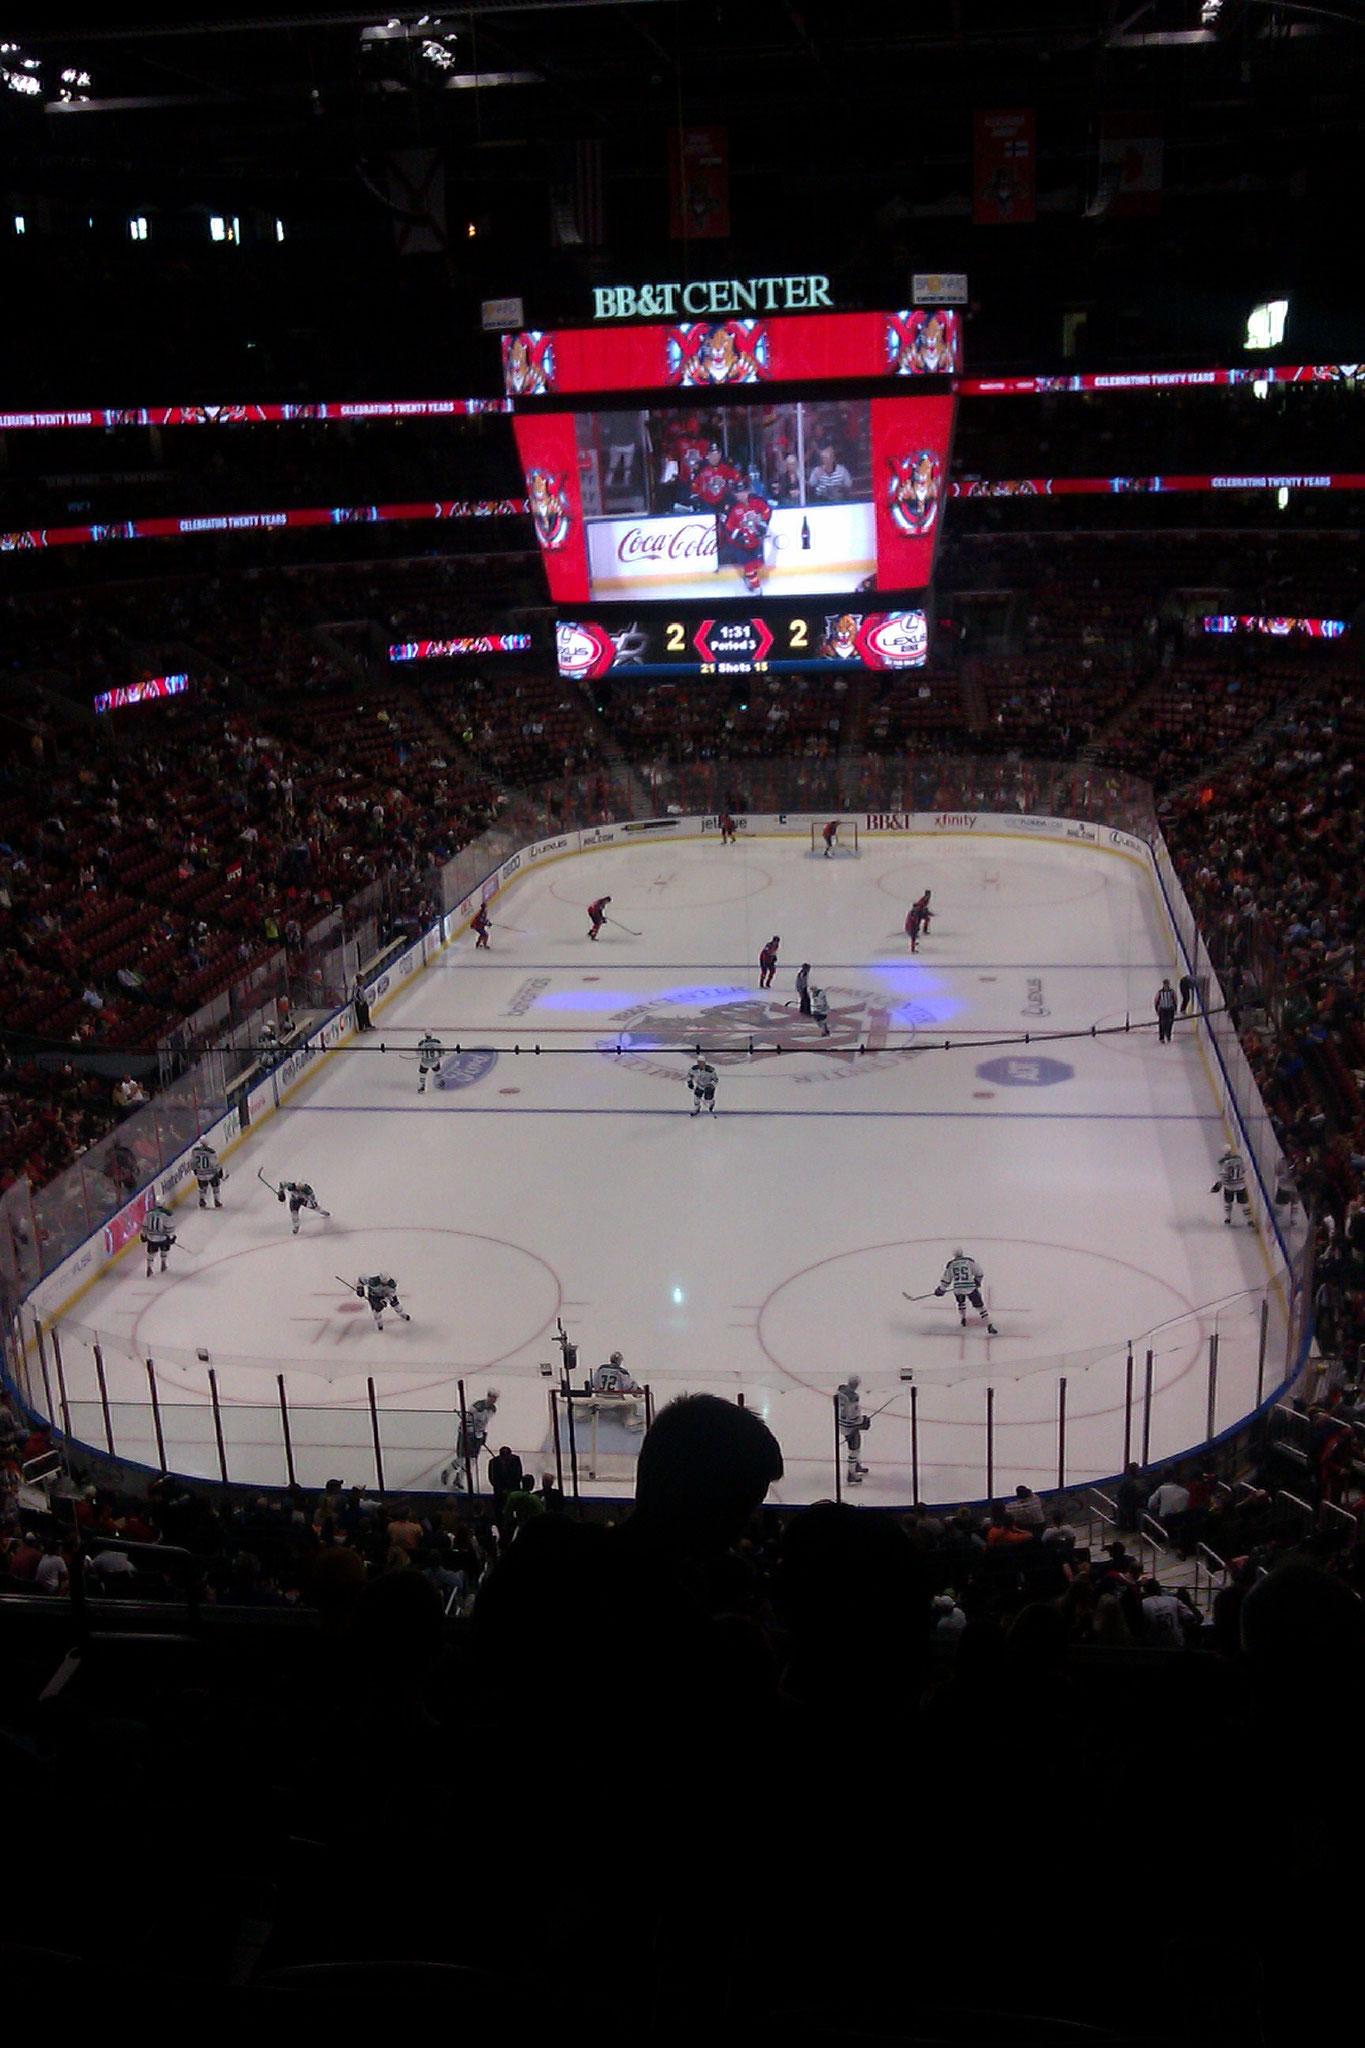 Florida Panthers vs Dallas Stars (2013/14)